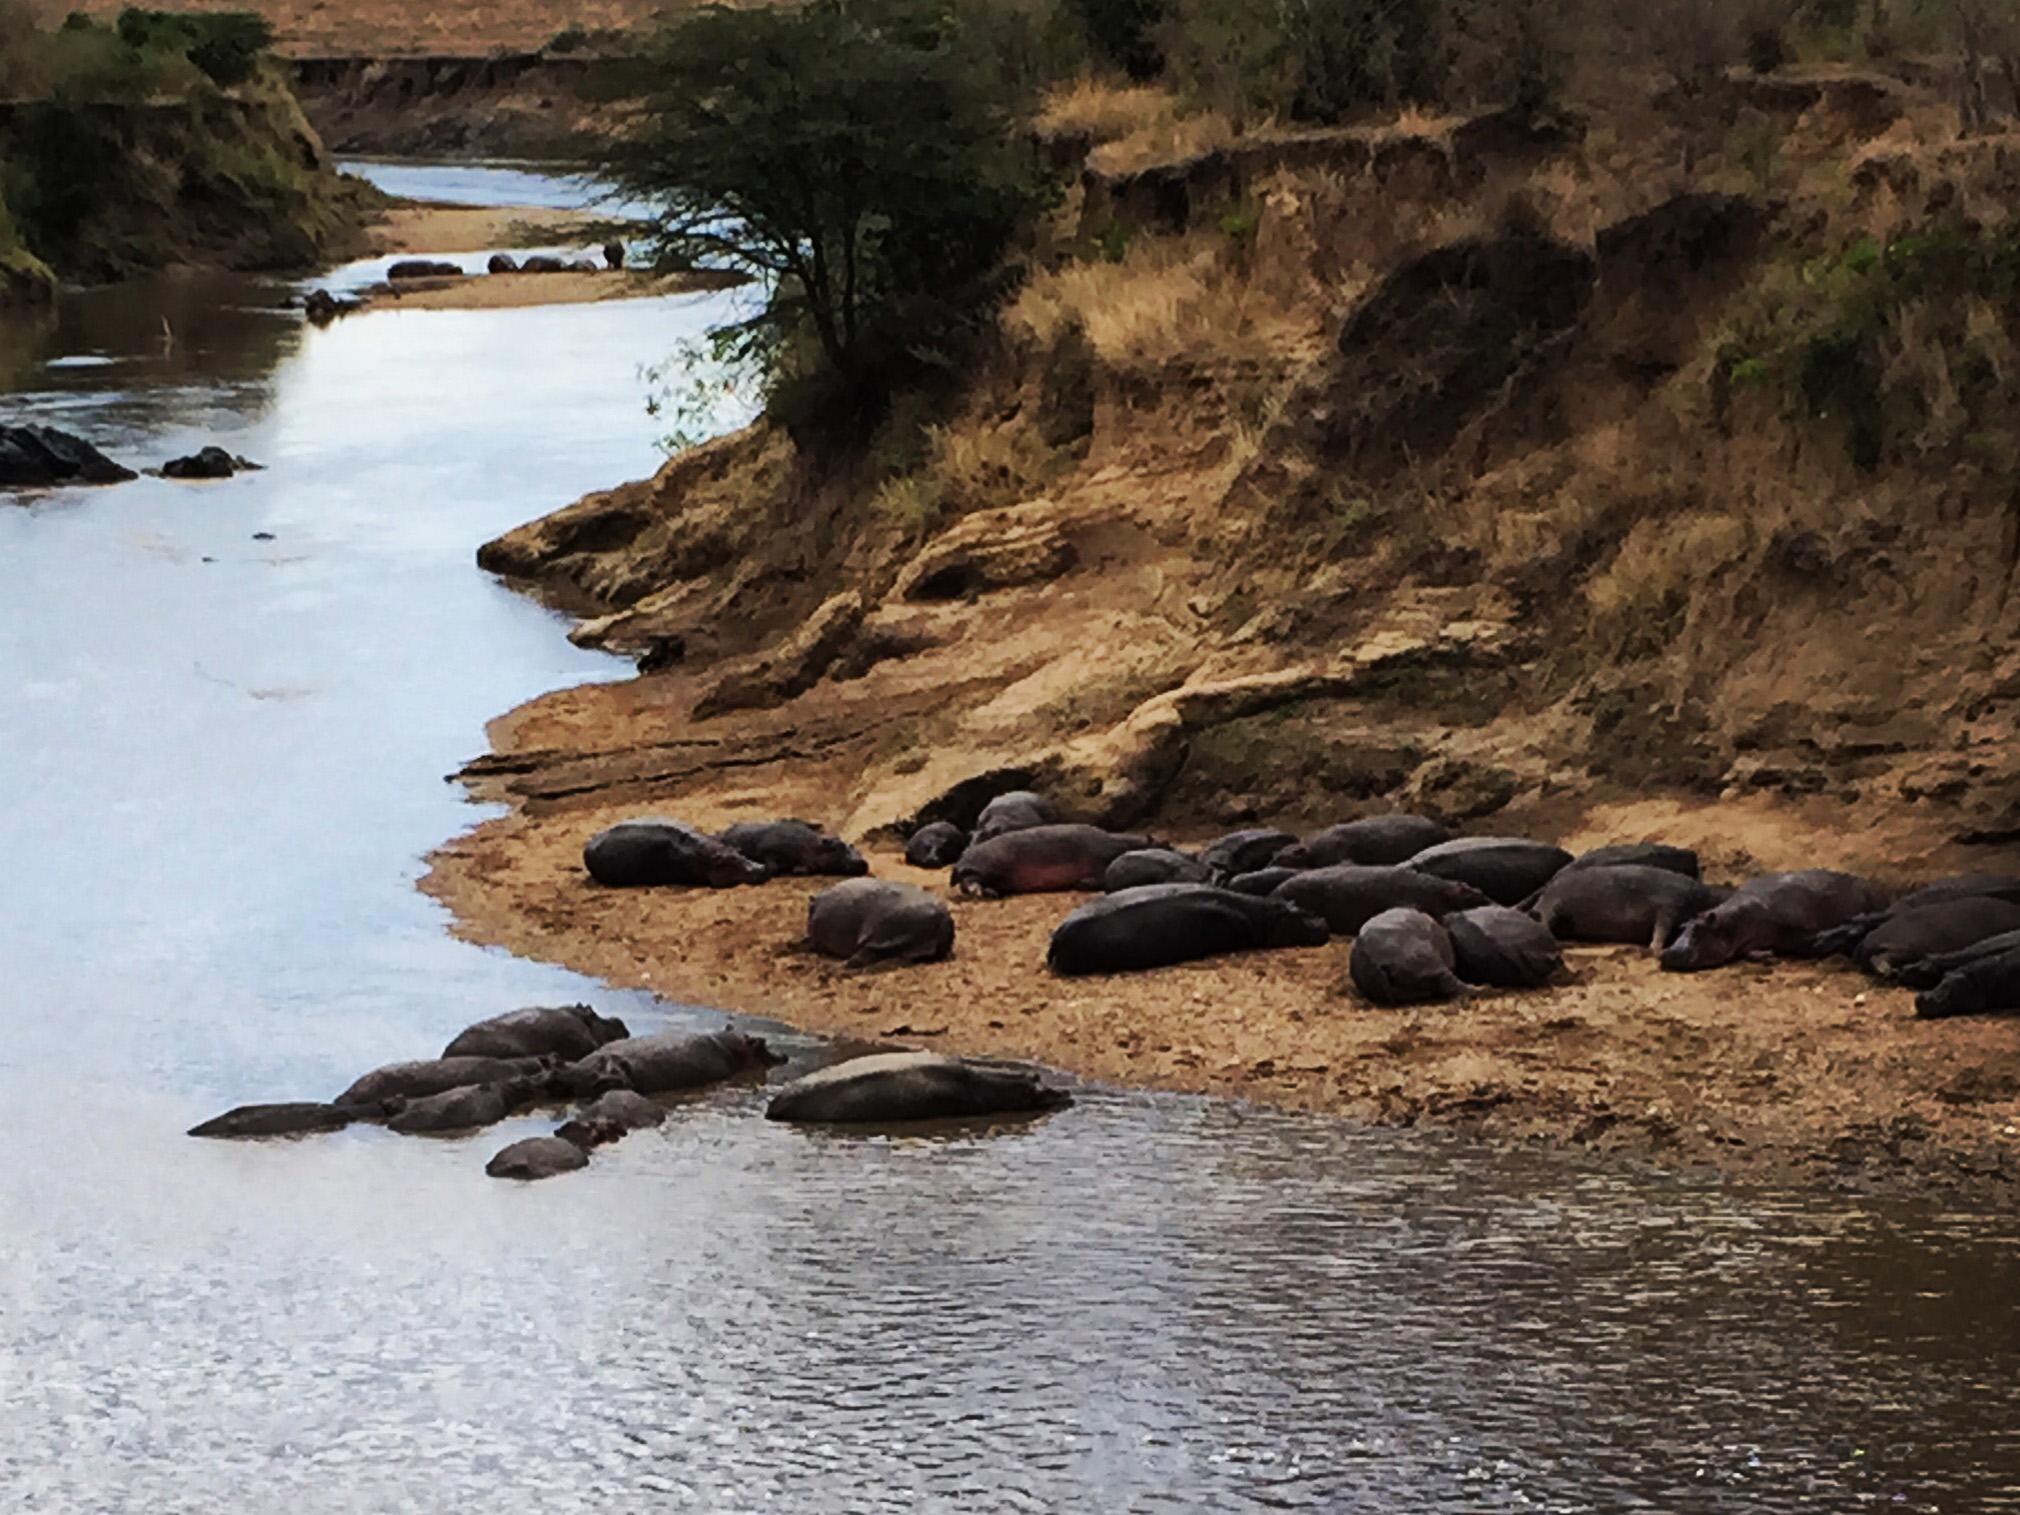 8 hippos2 (1).jpg